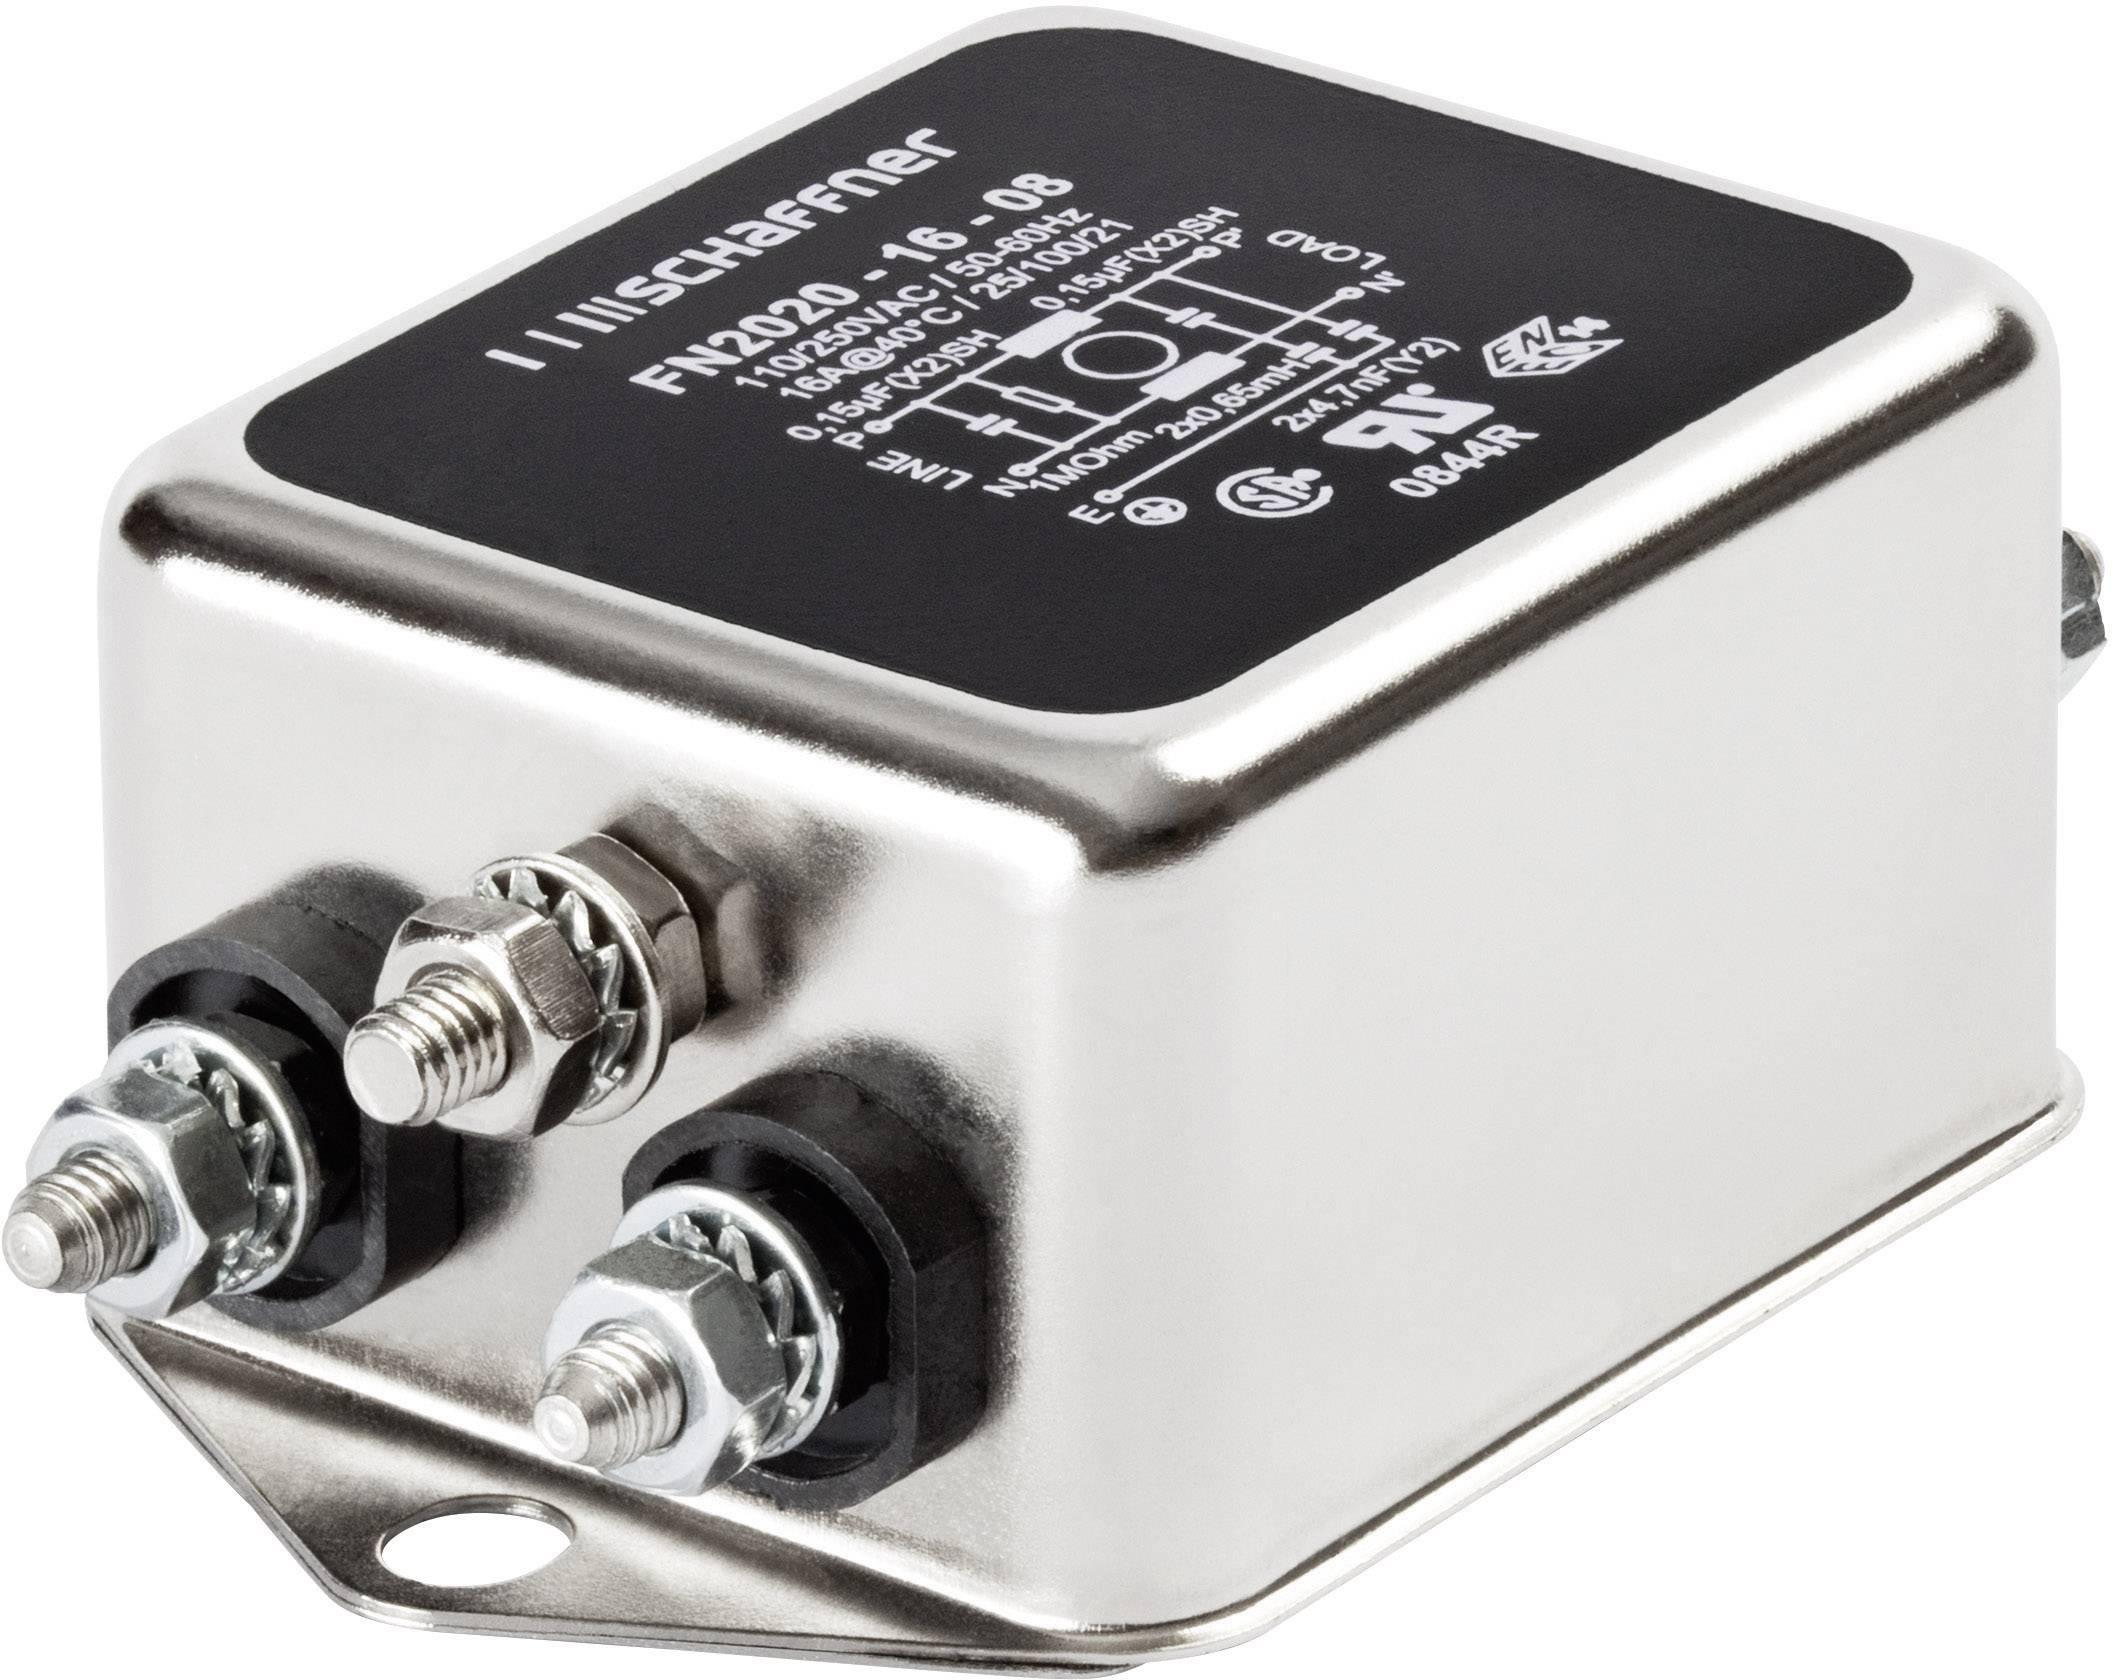 Odrušovací filter Schaffner FN 2020-1-06 FN 2020-1-06, 250 V/AC, 1 A, 12 mH, (š x v) 64 mm x 29.3 mm, 1 ks